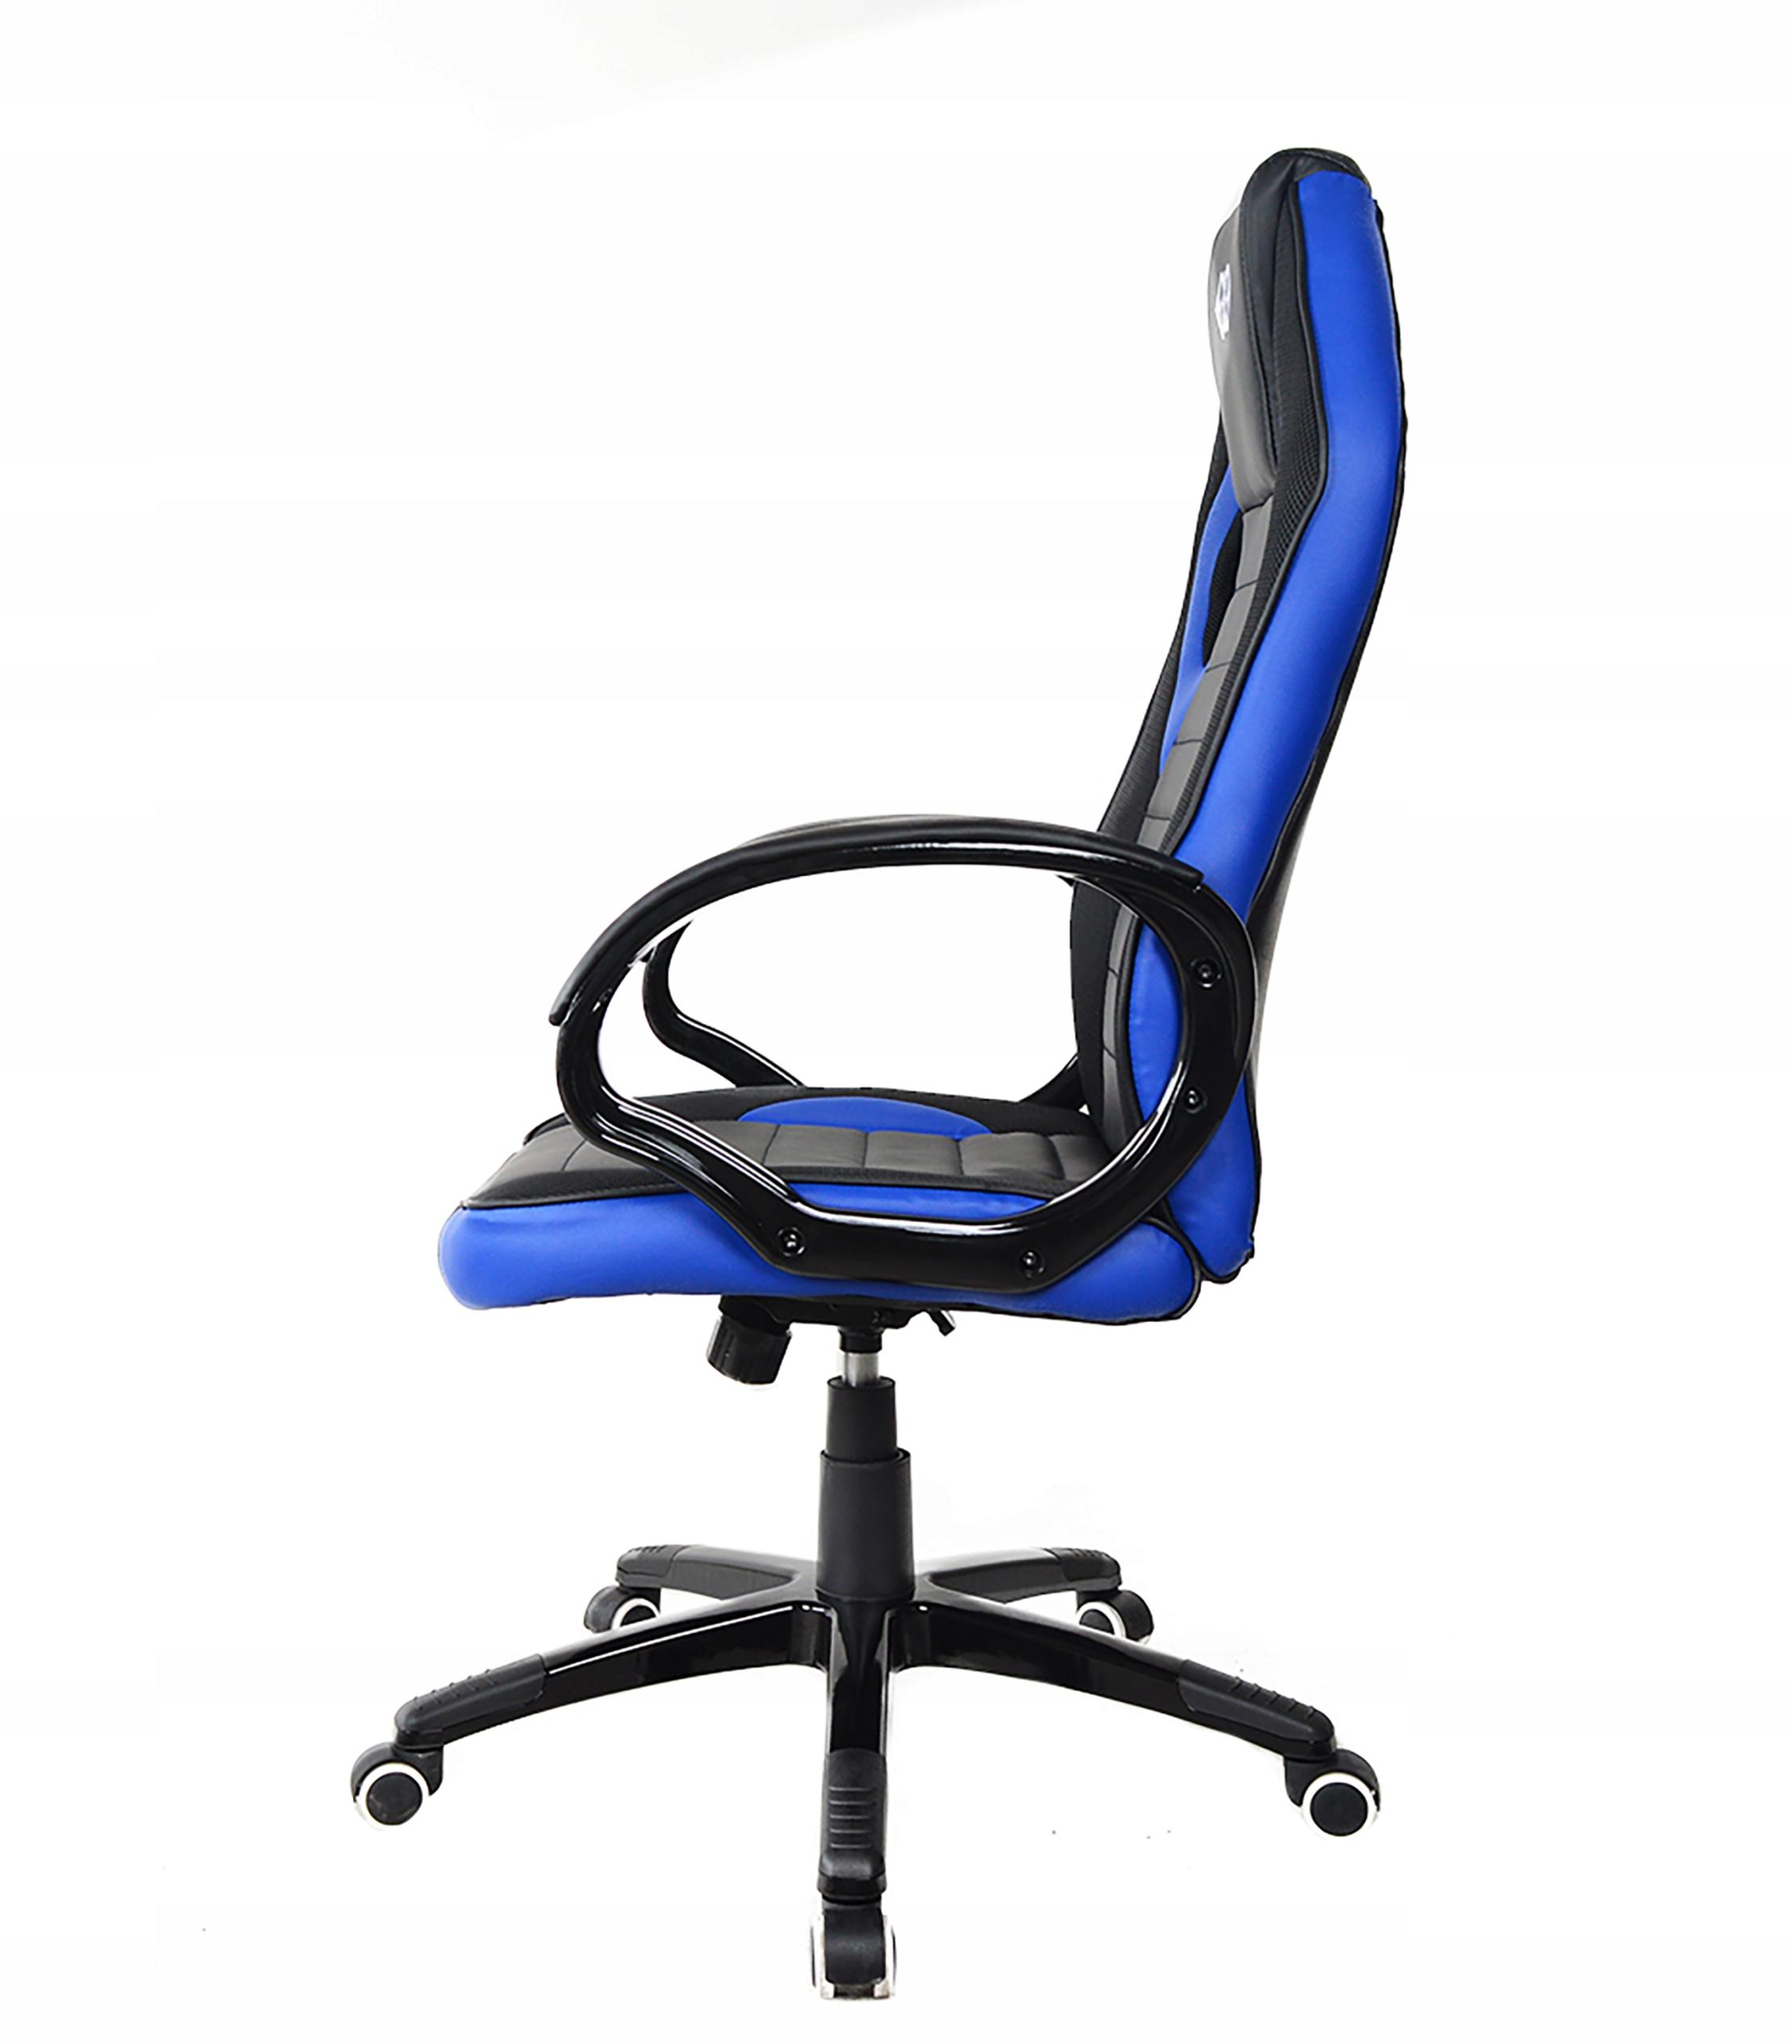 Поворотное игровое кресло Player's Premium Ширина мебели 64 см.